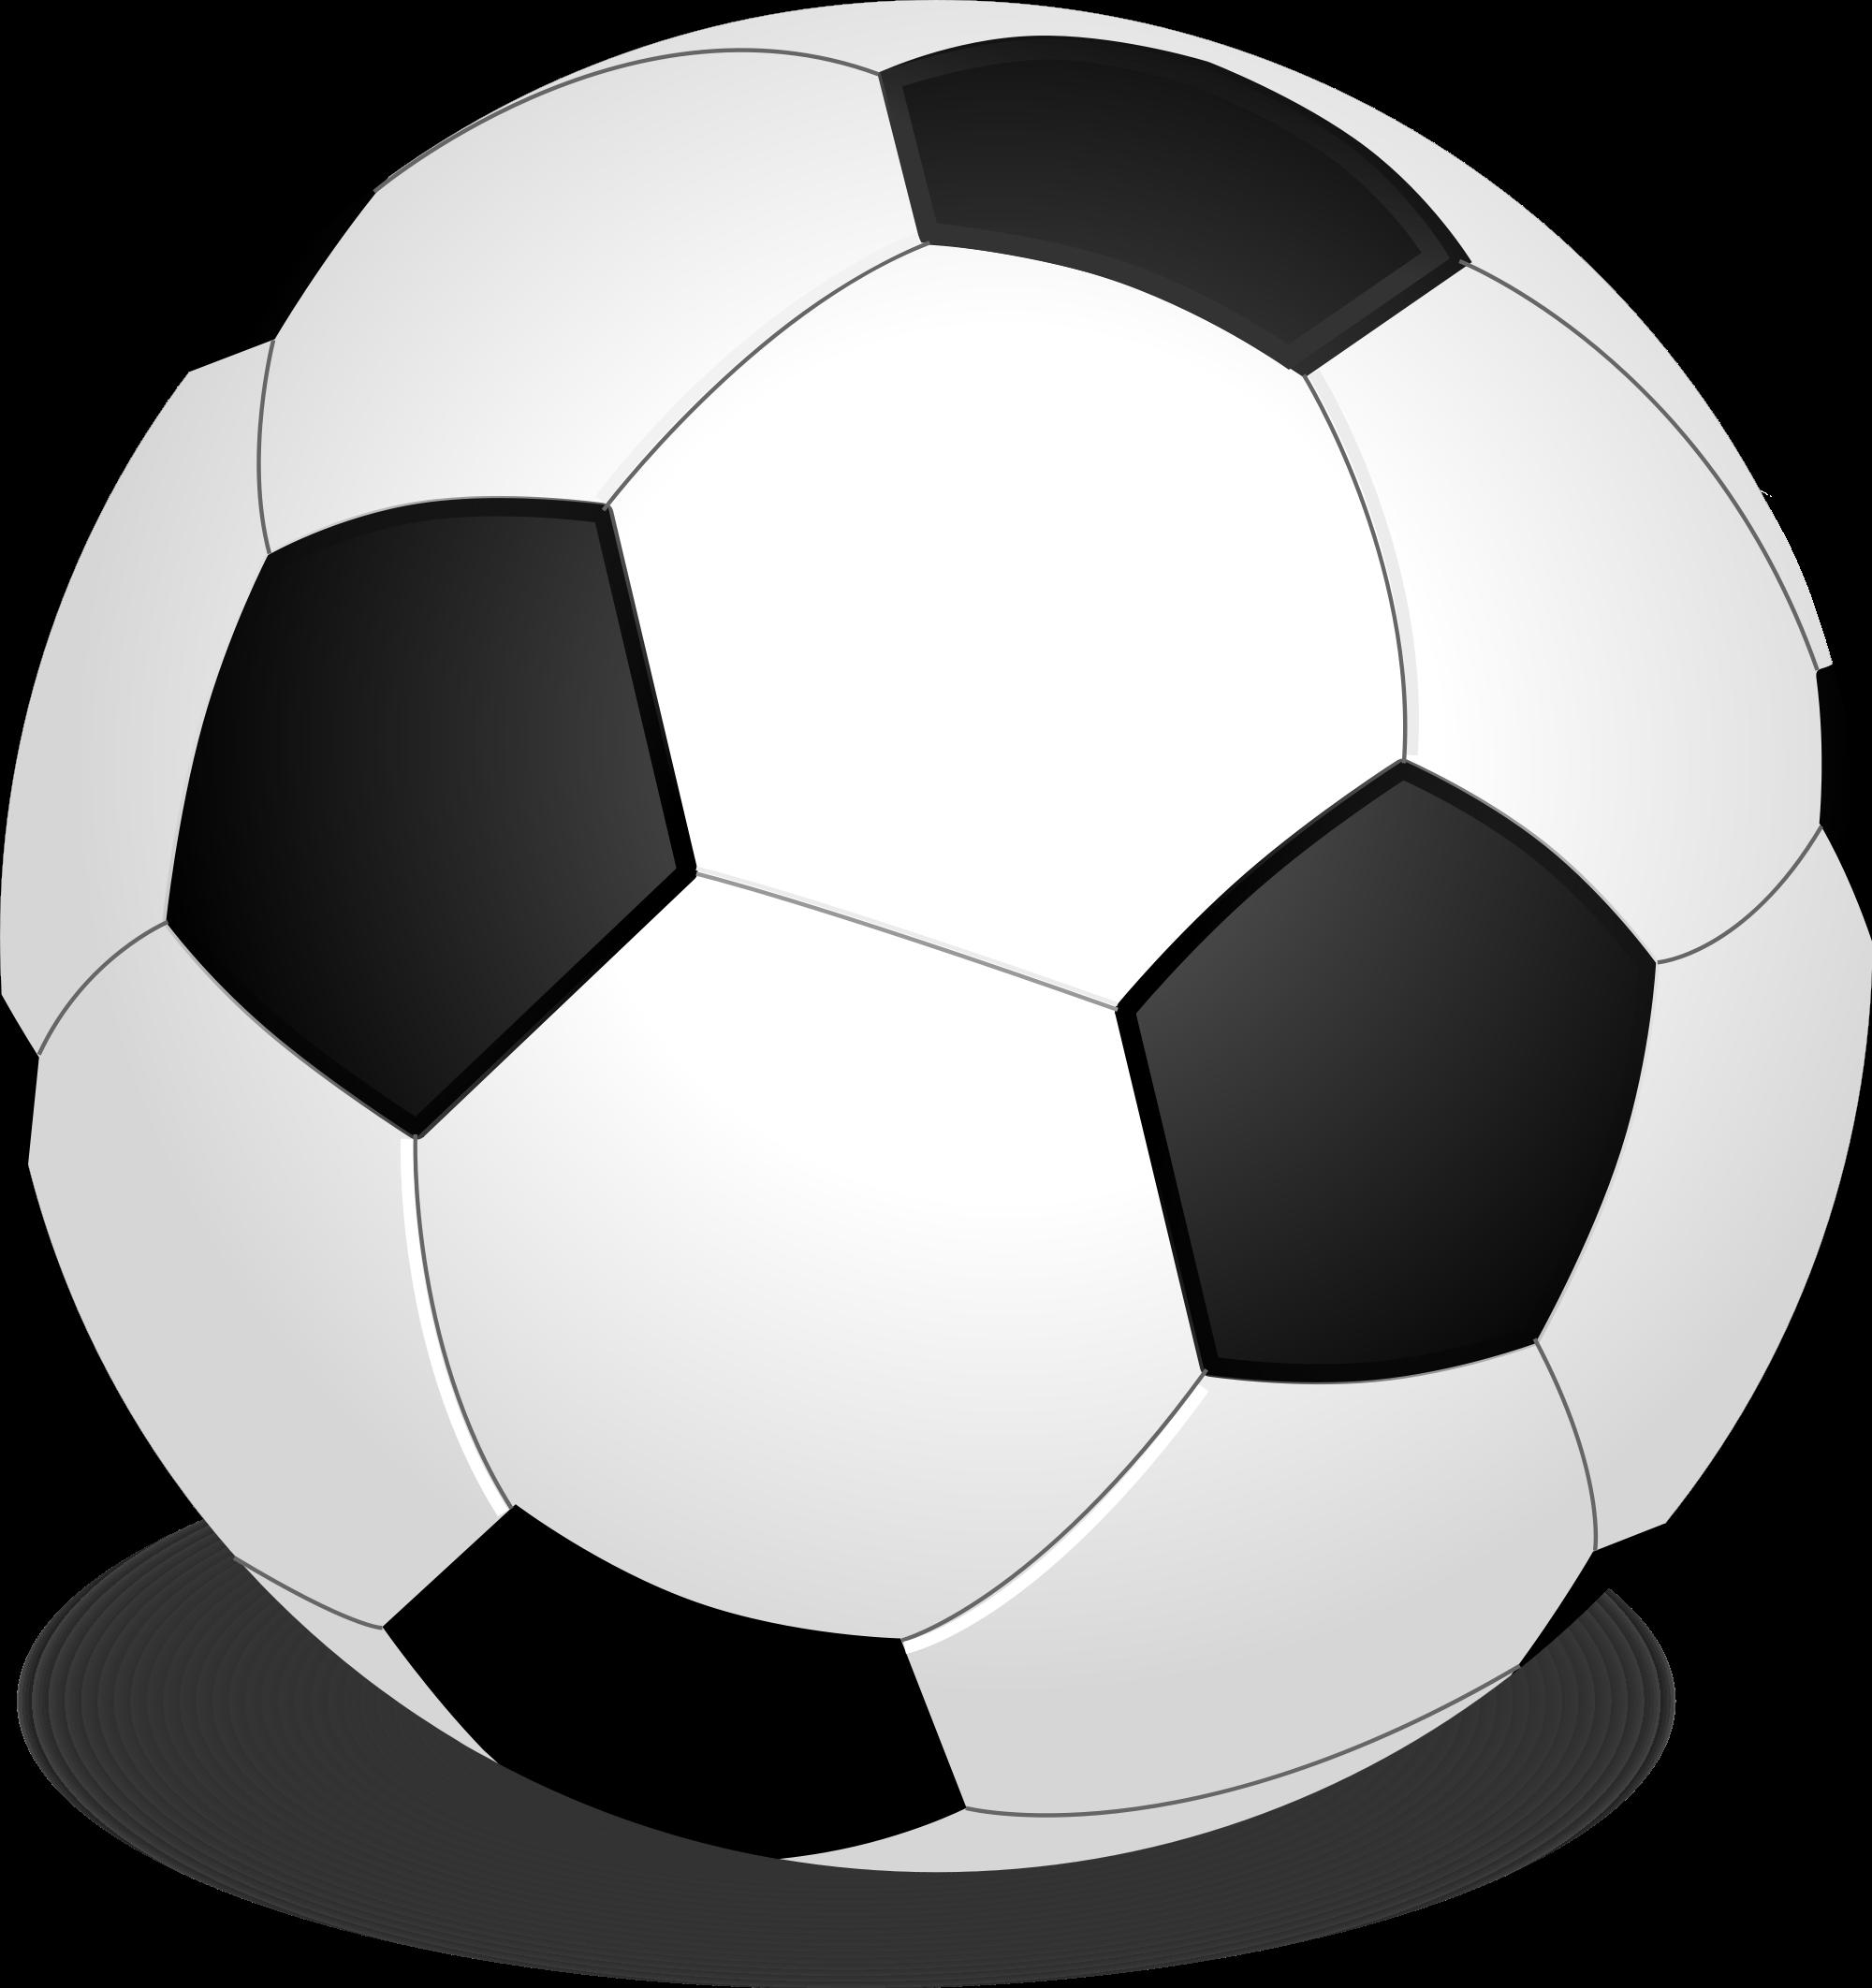 2000px-Football_-soccer_ball-svg